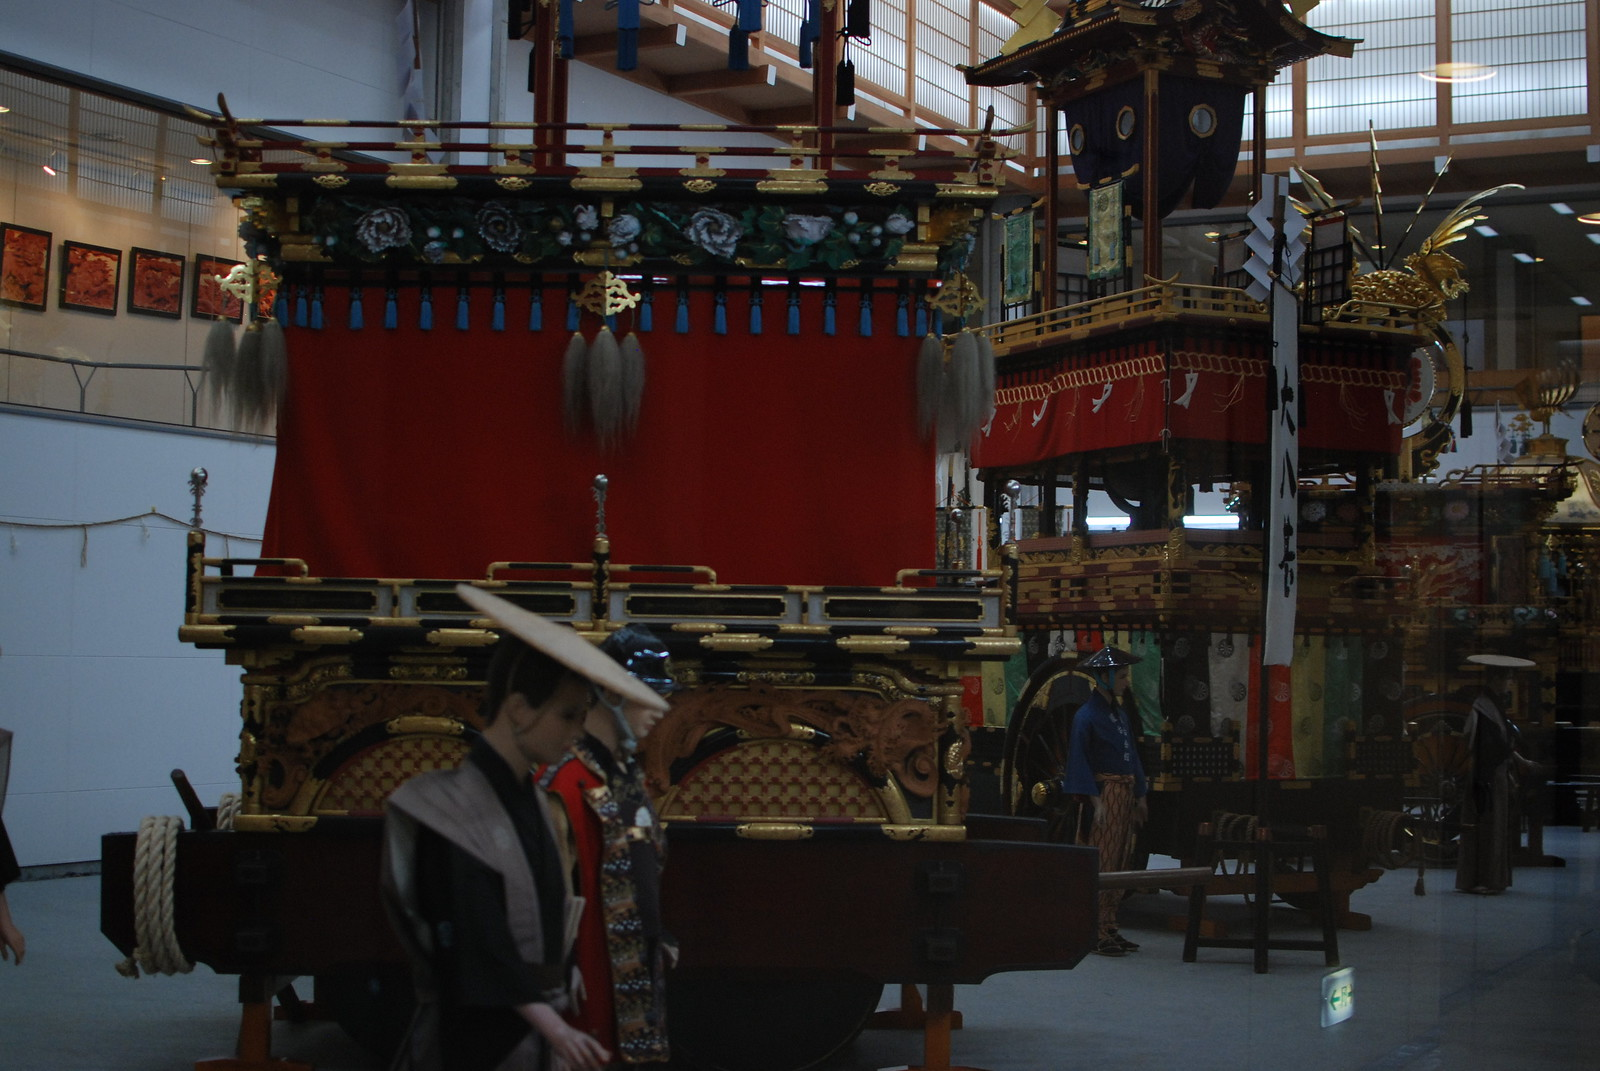 Algunas carrozas centenarias en Takayama